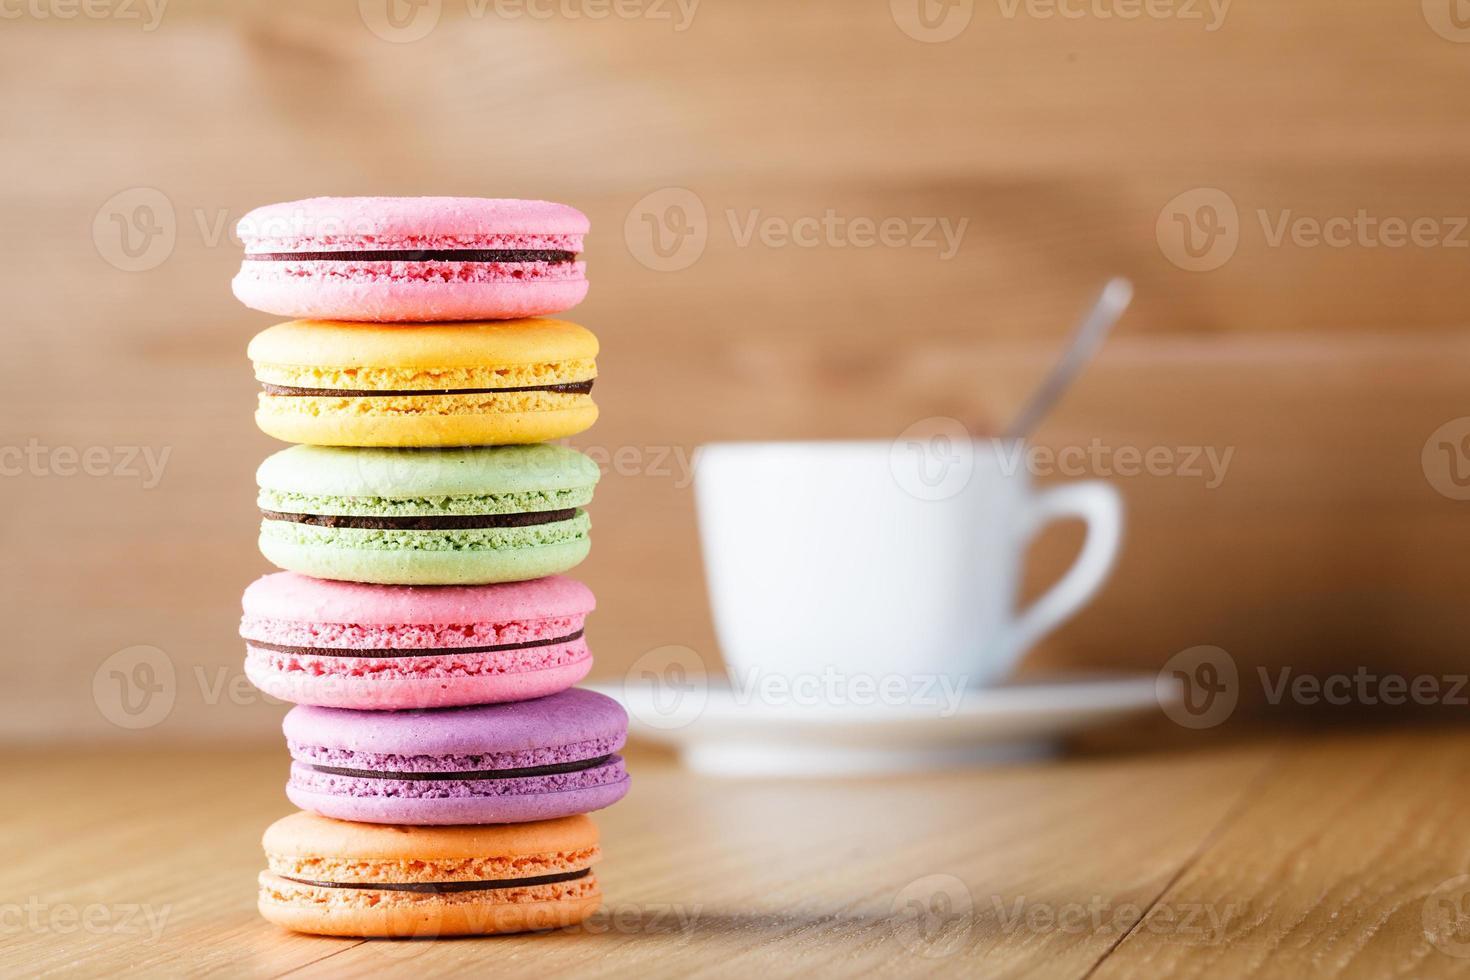 zes kleurrijke Franse macaron en beker foto